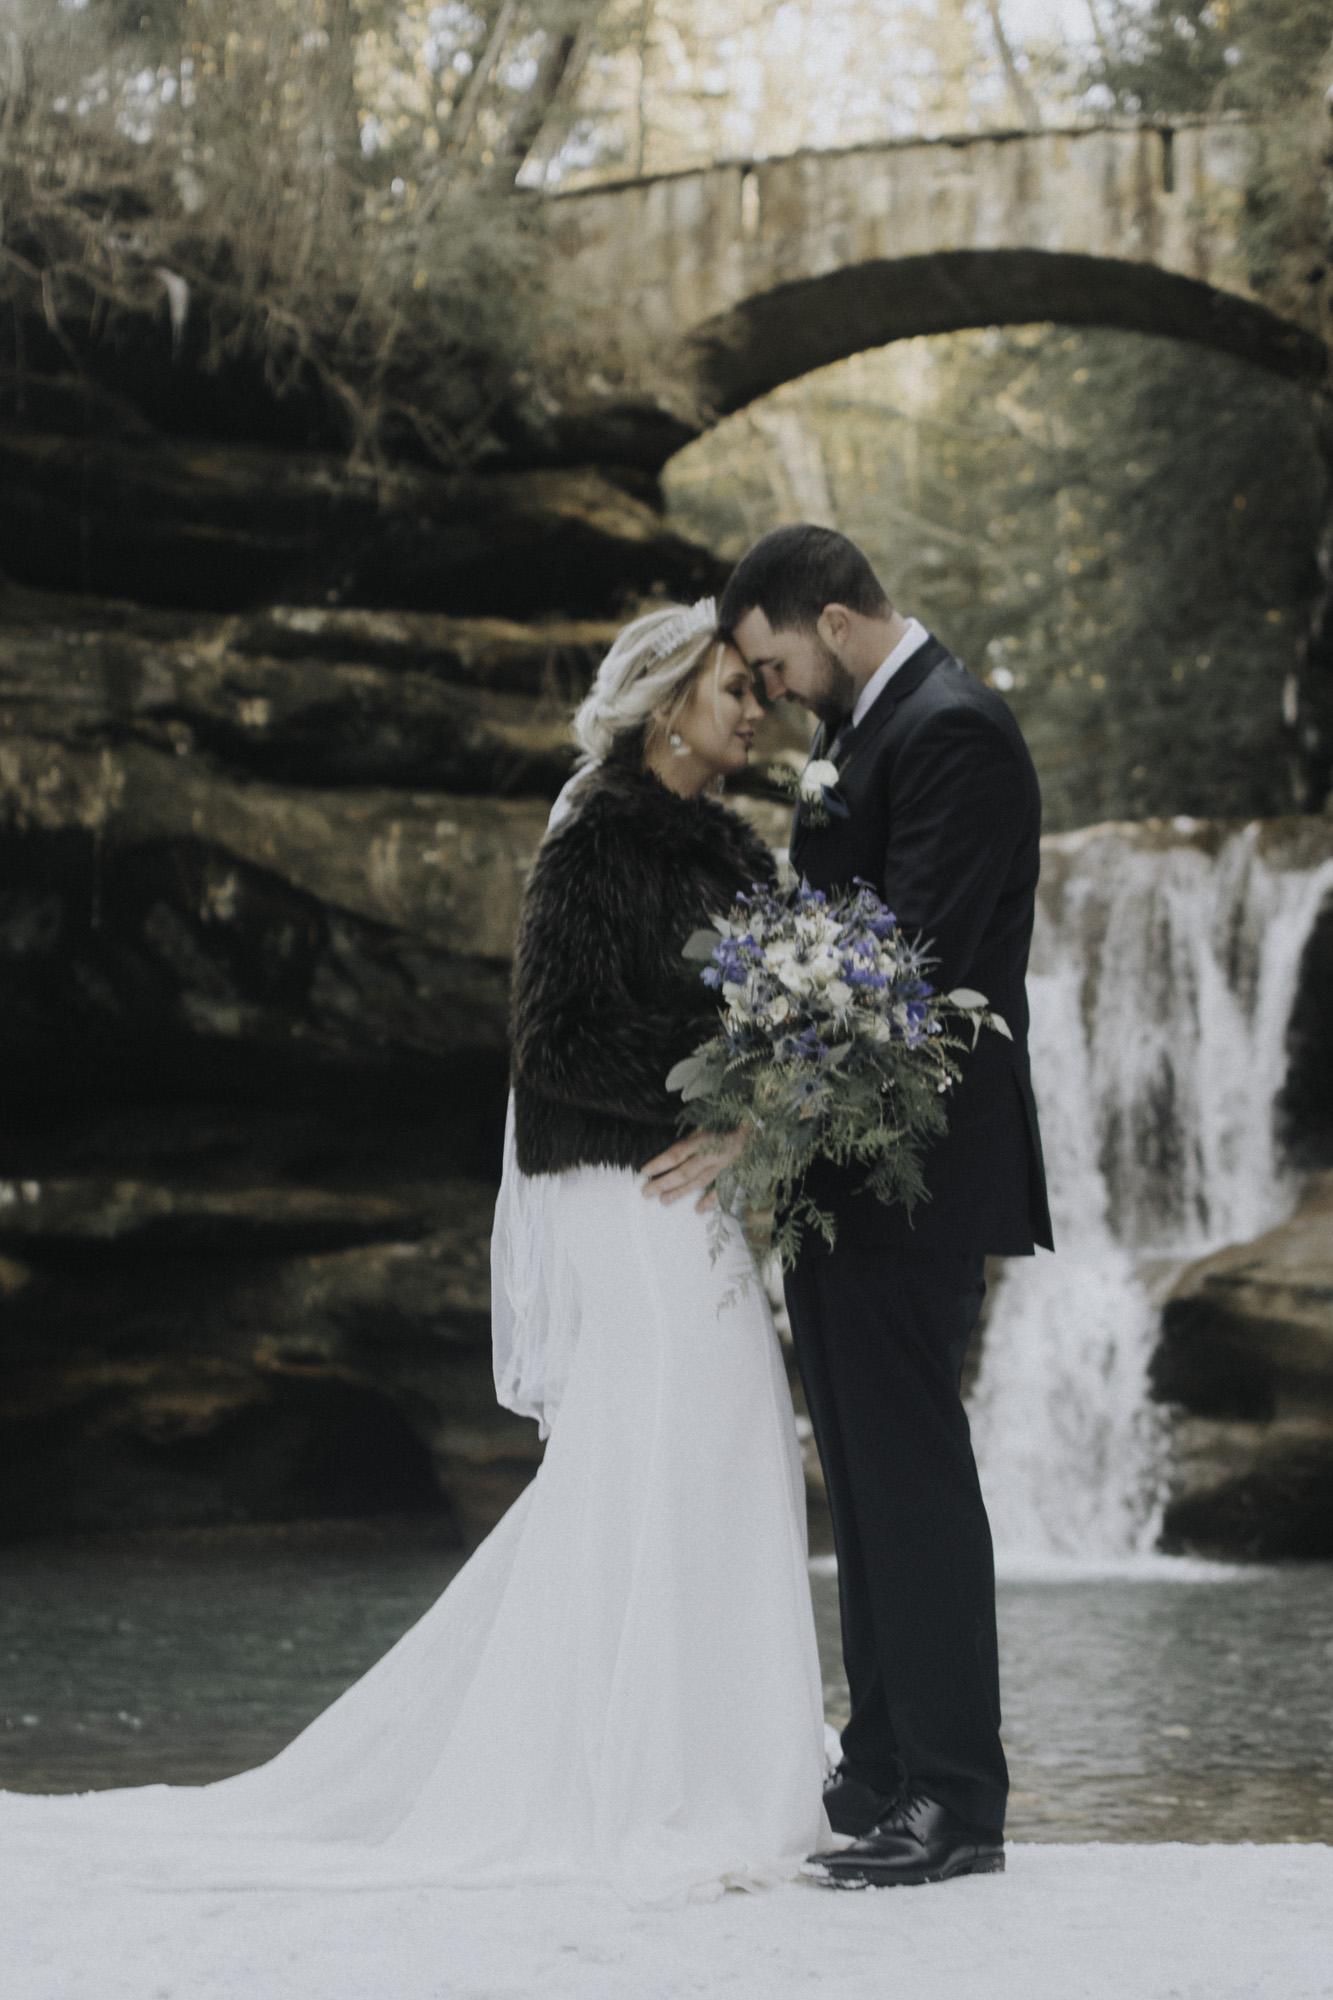 Cate_Ann_Photography_Dayton_Ohio_Wedding_Elopement_And_Engagement_PhotographerDSC_6108.jpg